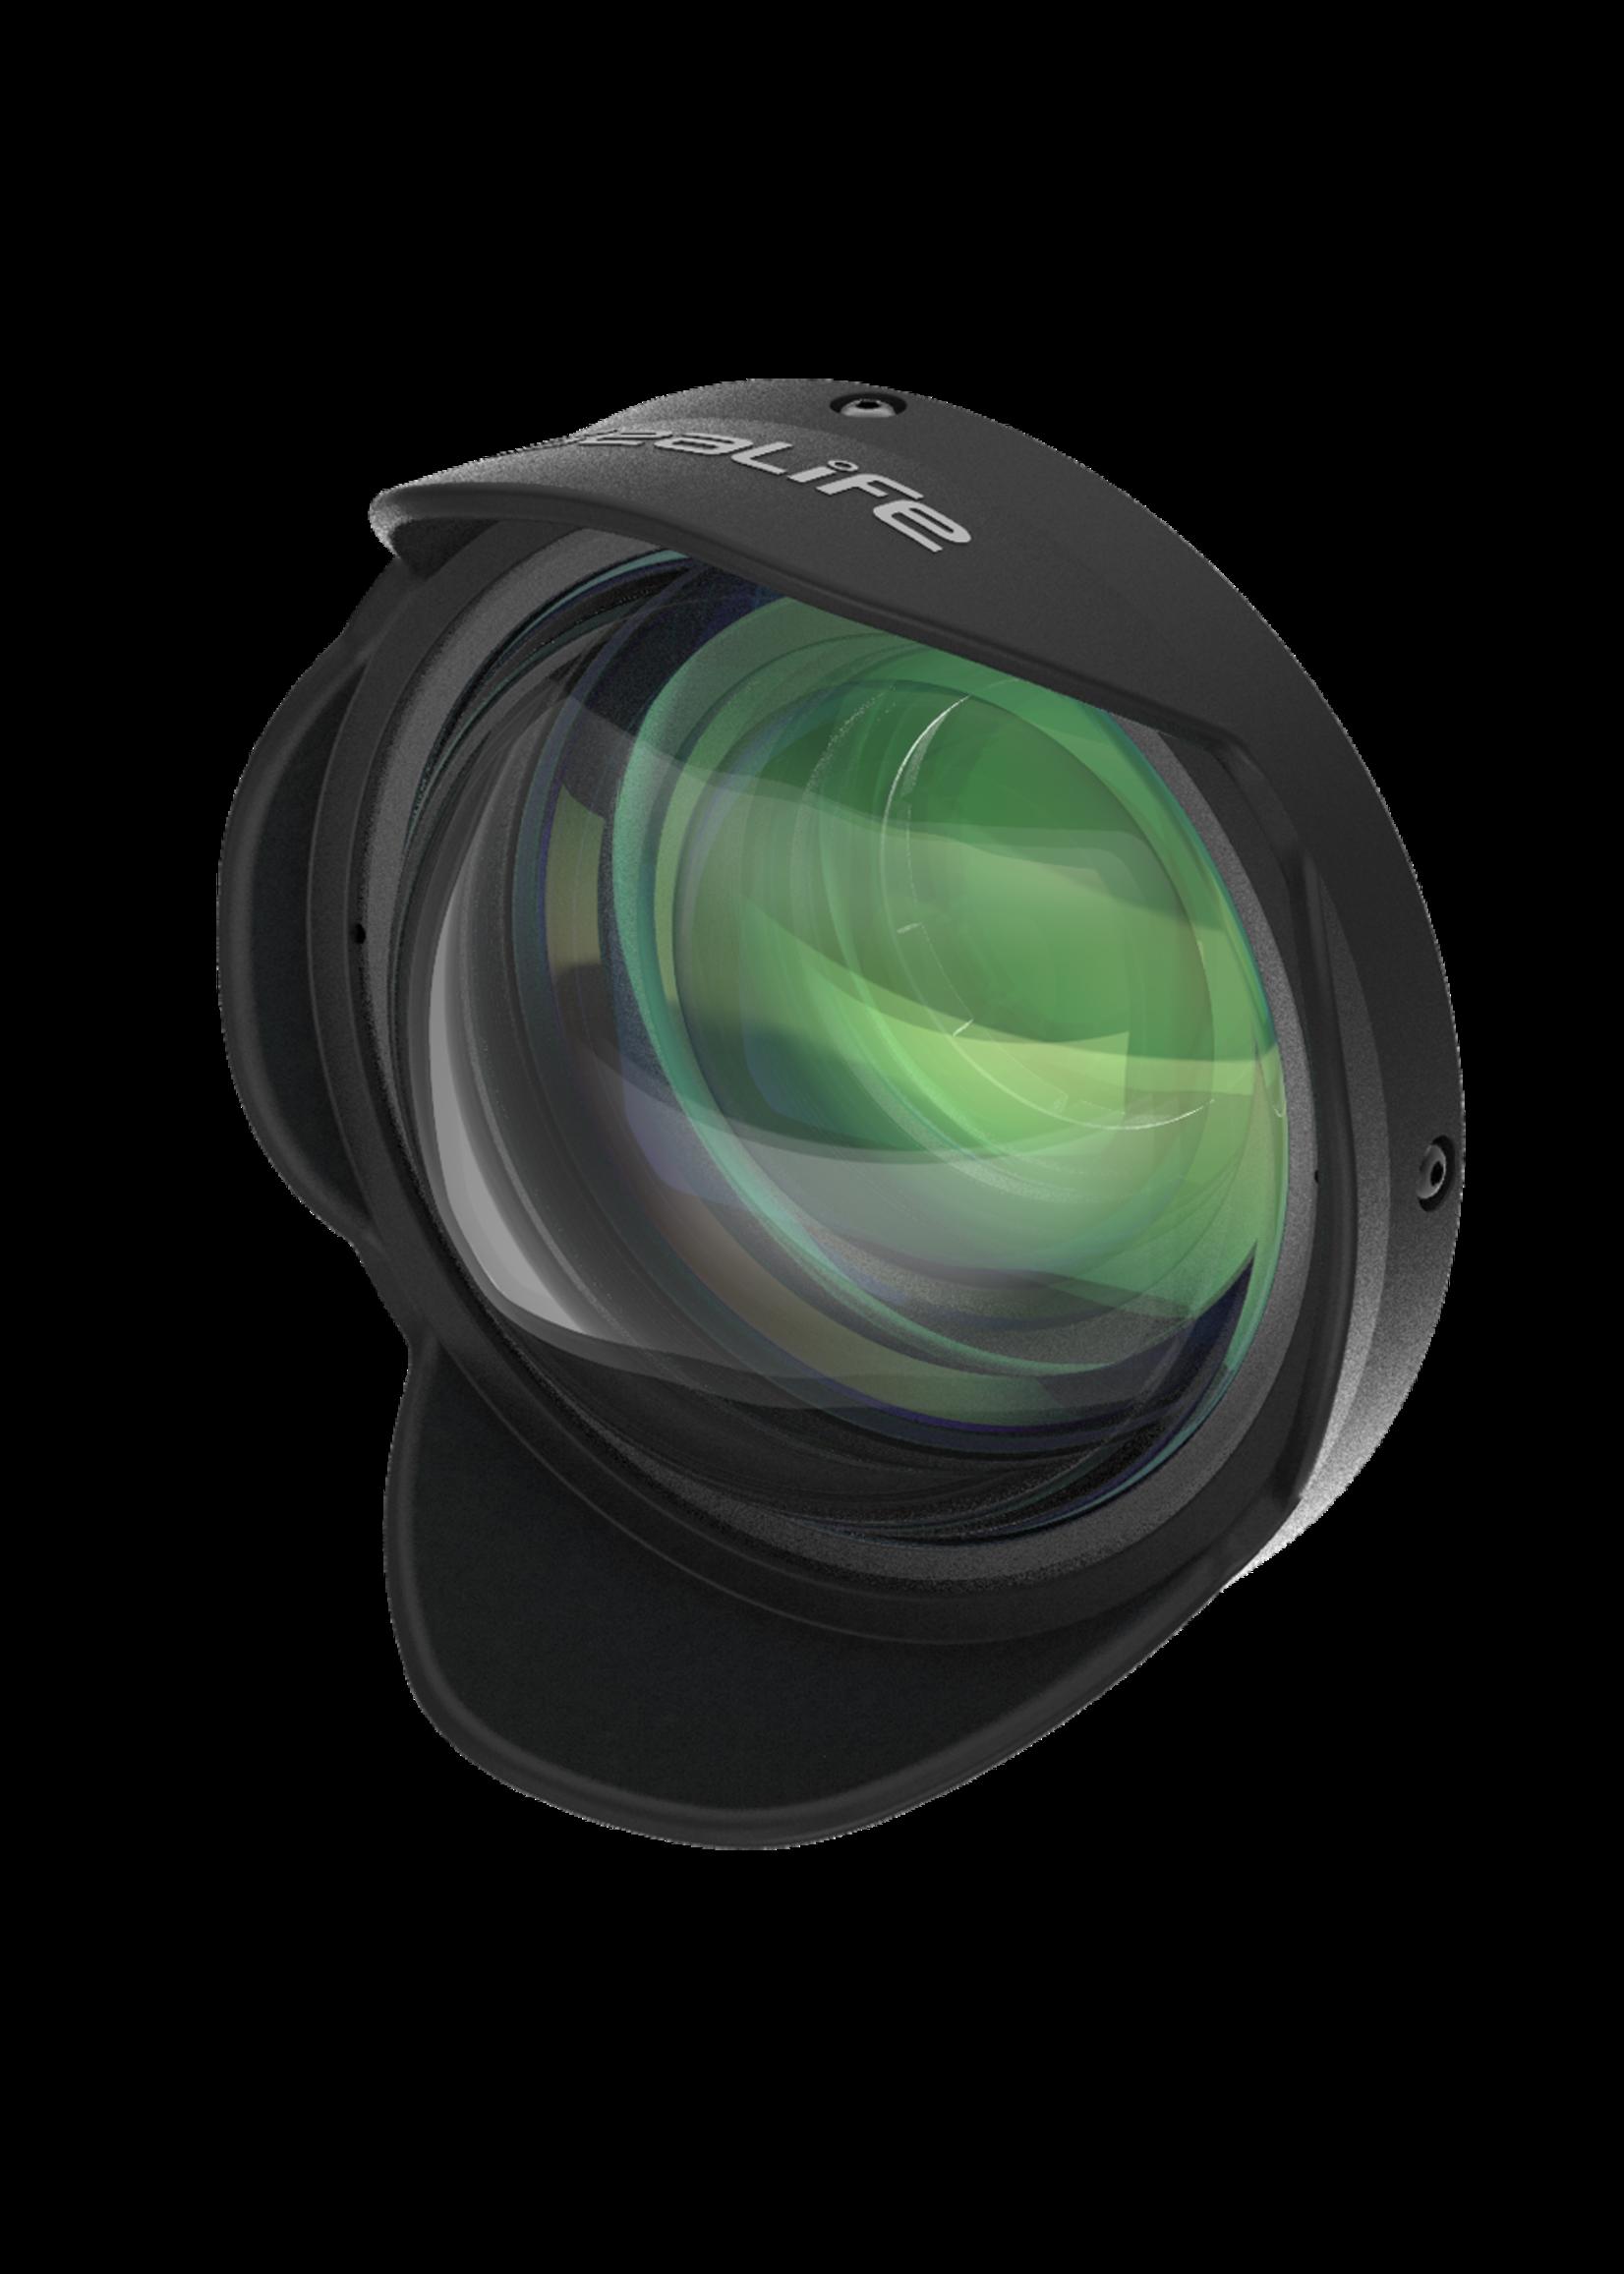 Sealife Sea Life 0.5x Wide Angle Dome Lens for DC-Series Cameras